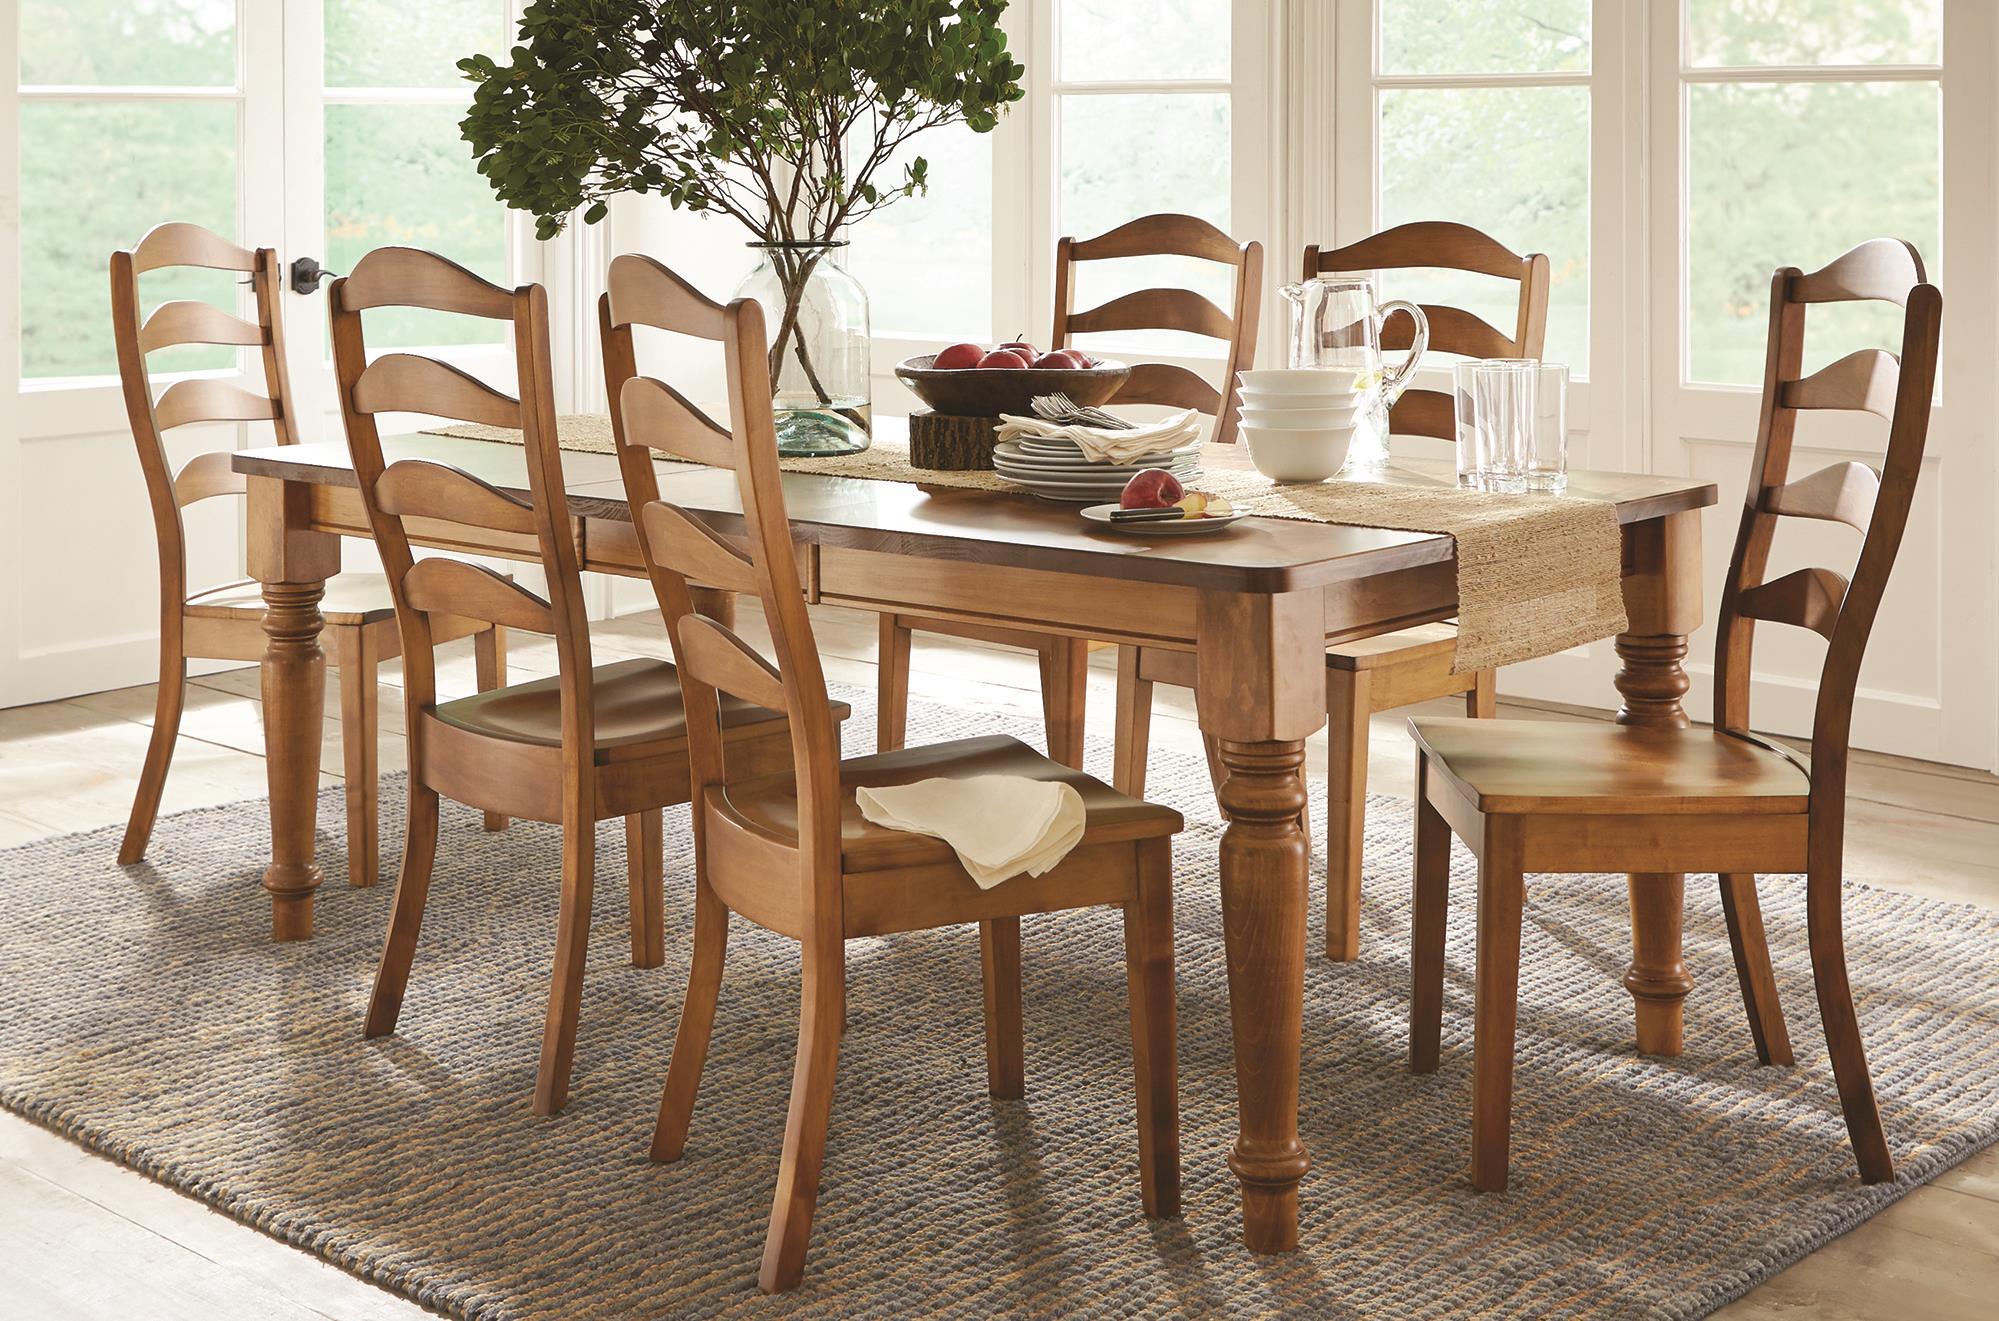 L.J. Gascho Furniture ColfaxColfax 5 Piece Solid Wood Dining Set